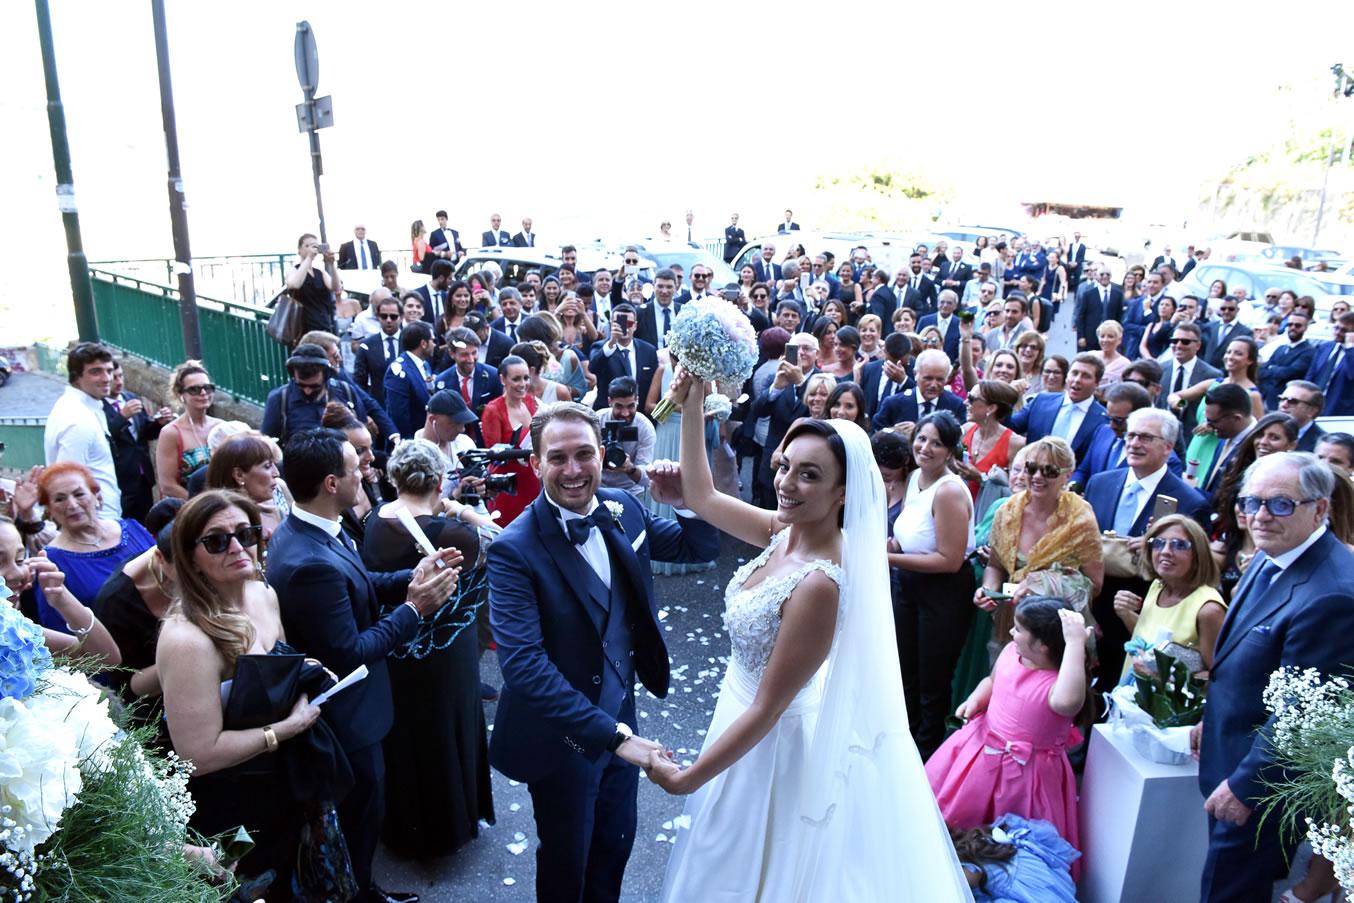 fotografo-matrimonio-napoli-49